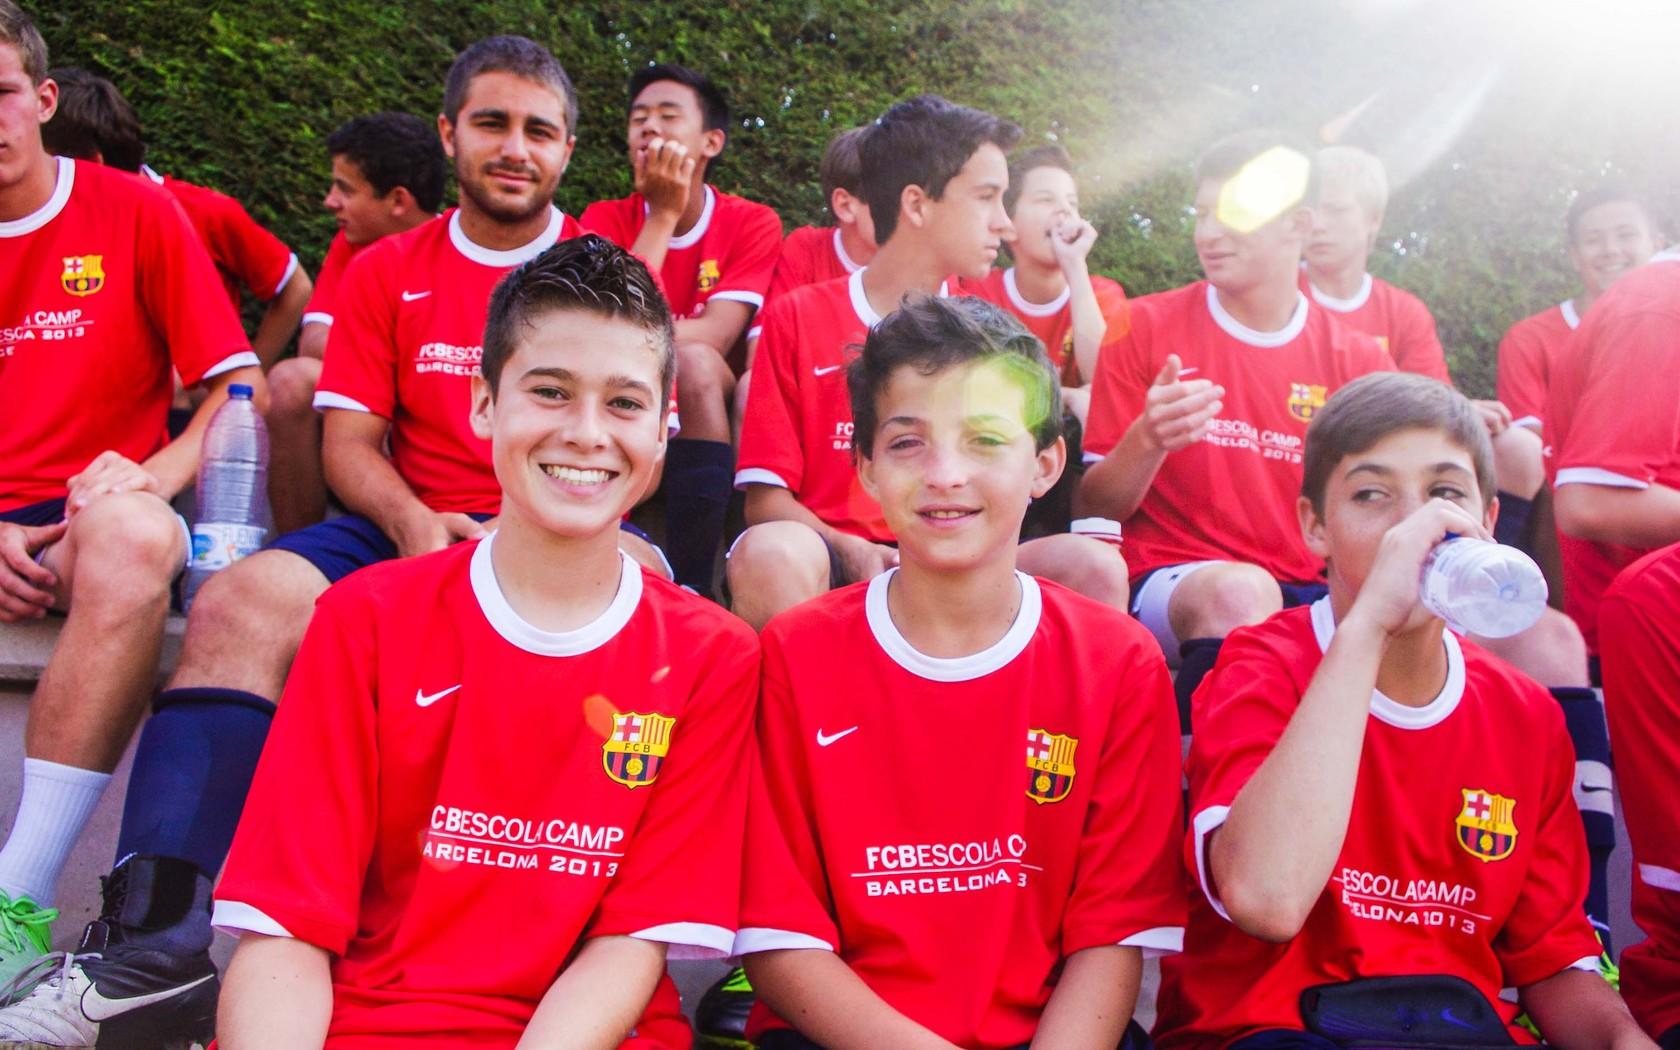 Barca Academy: Английский/испанский + футбол